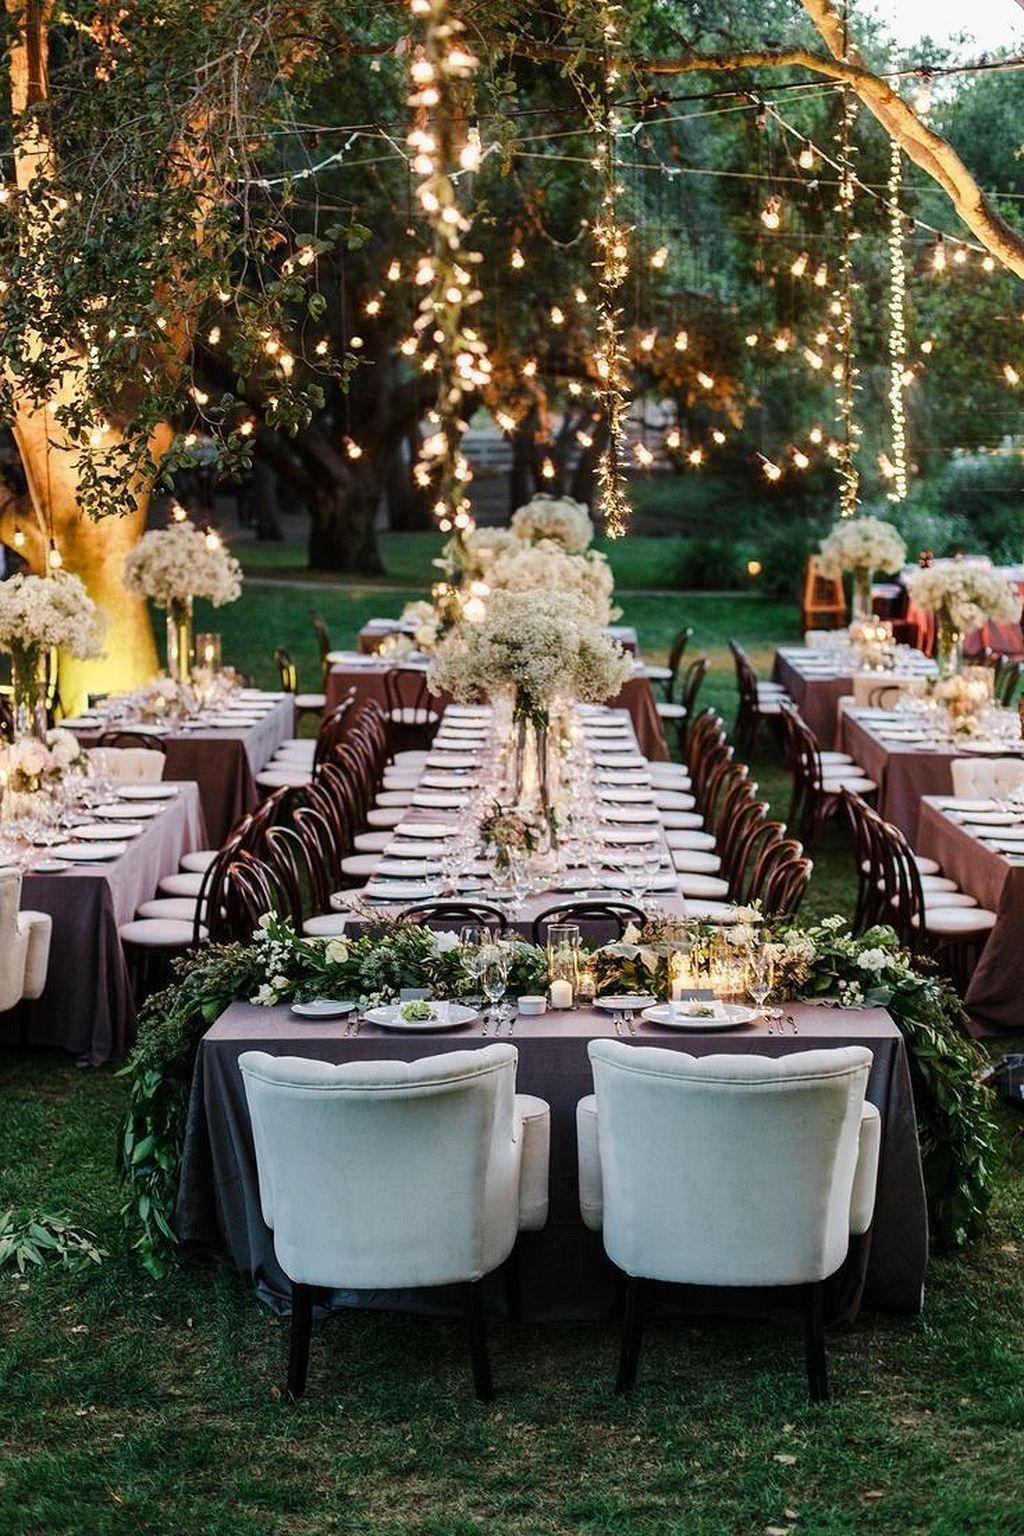 40 Wonderful Backyard Wedding Ideas | Backyard weddings, Backyard ...